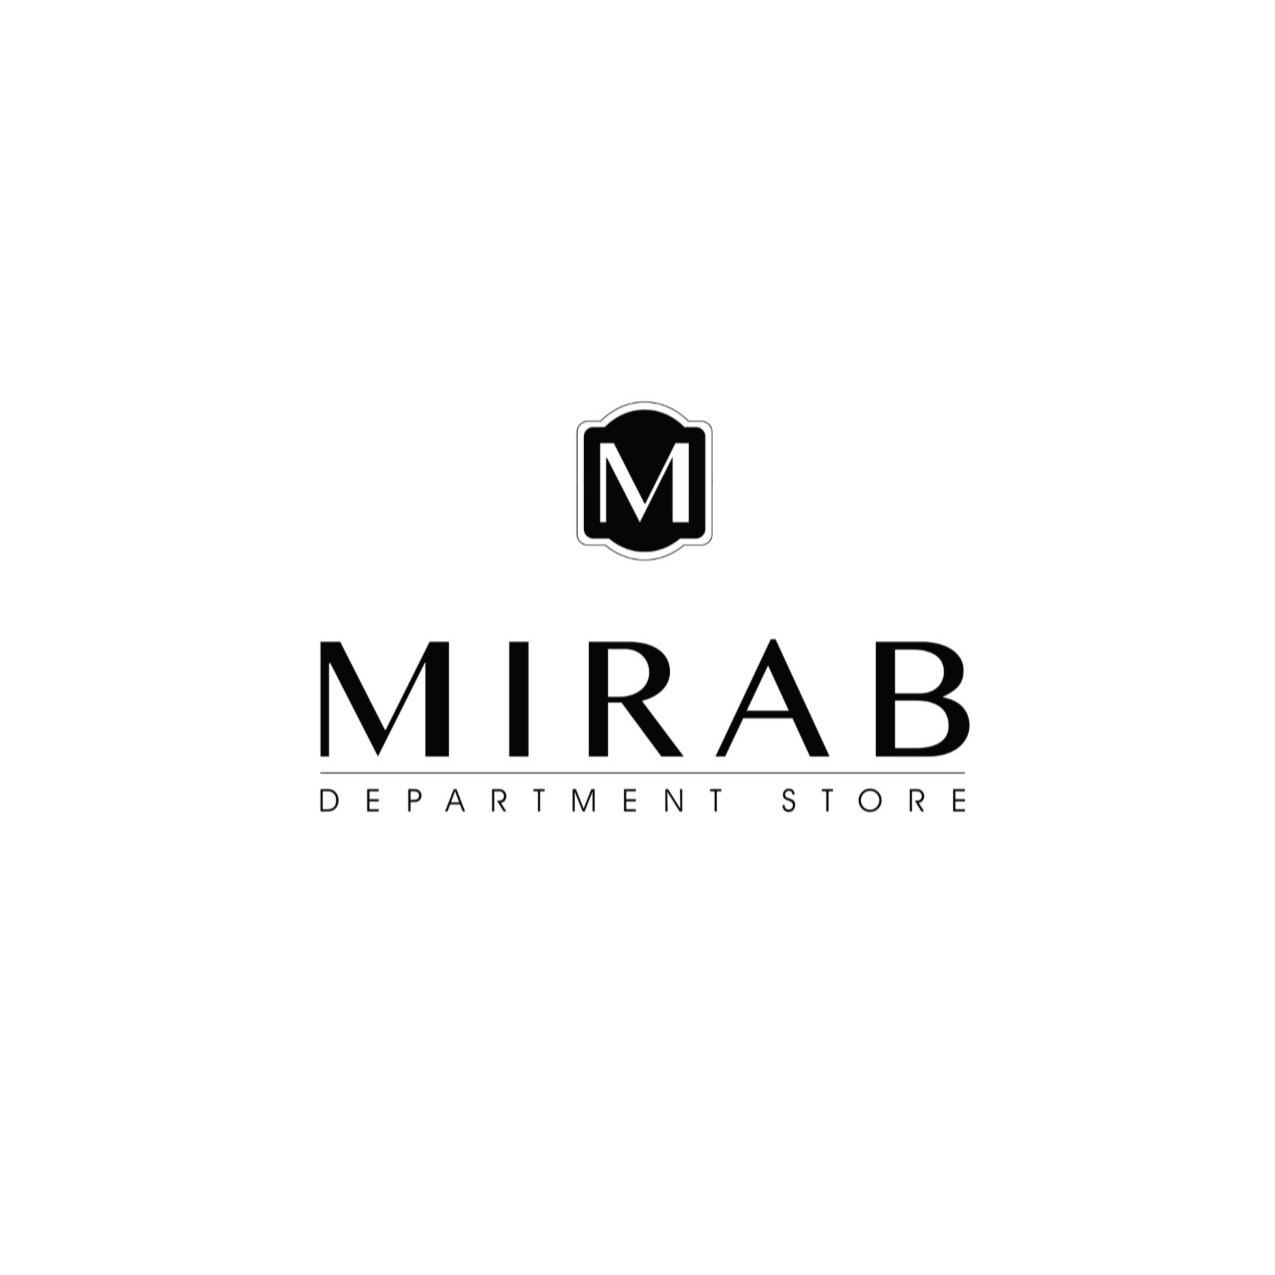 Mirab & Co